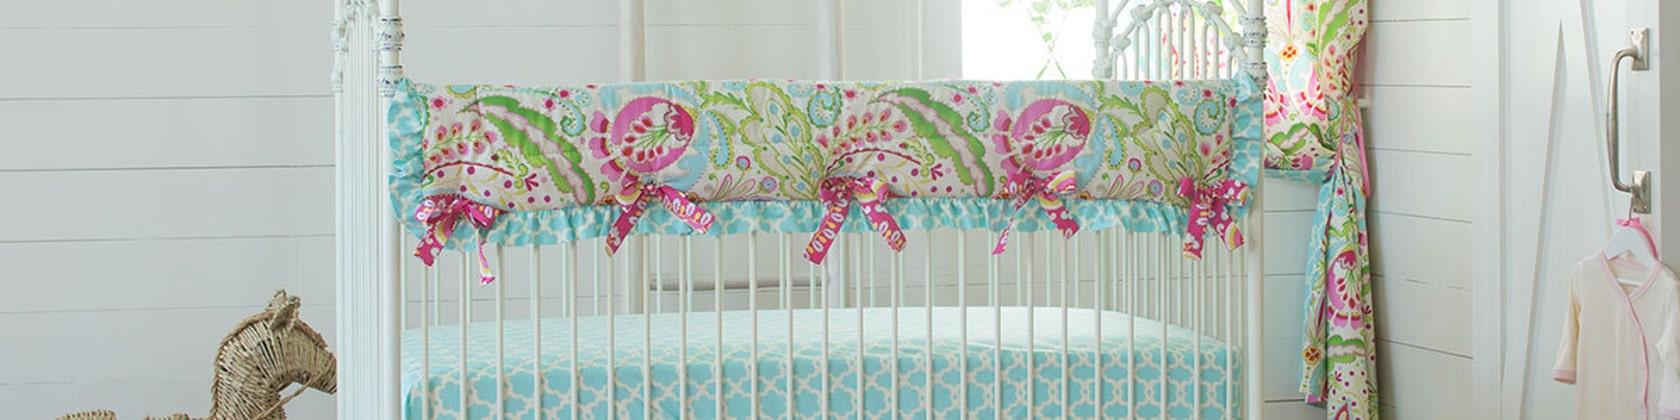 Baby Bedding Fabric And Nursery Décor, Purple Elephant Mini Crib Bedding